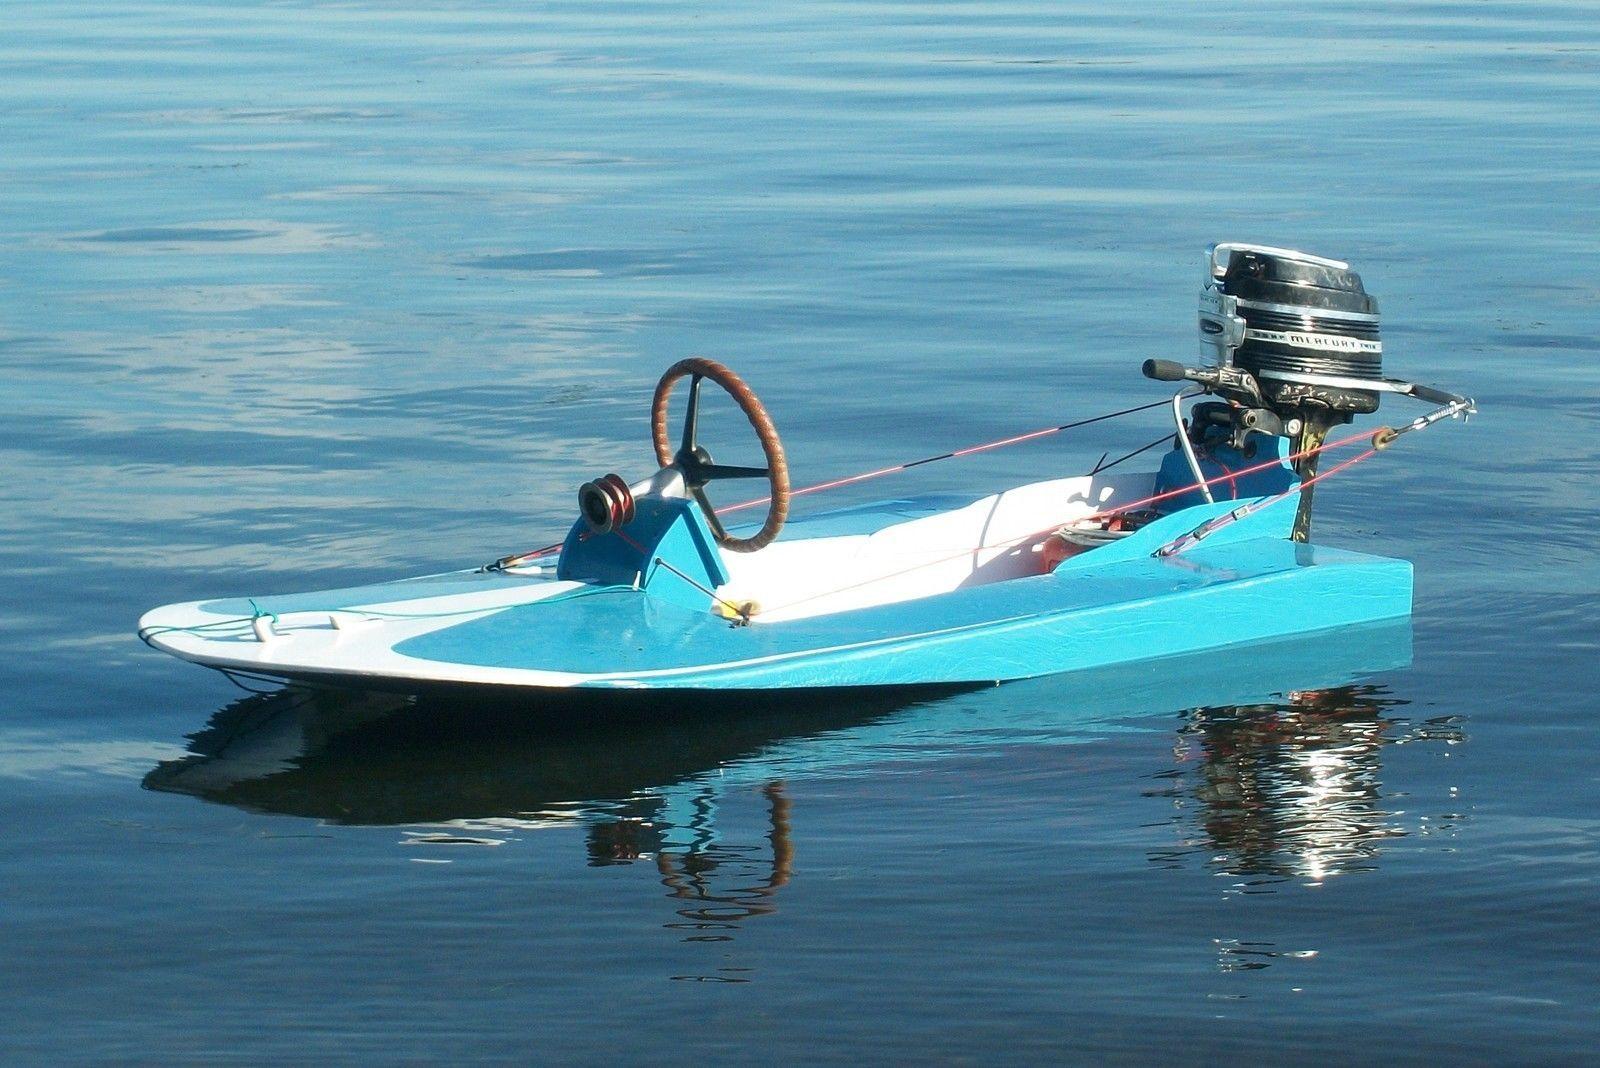 ... Hydroplane Steering Google Search Boat Building - 1600x1068 - jpeg